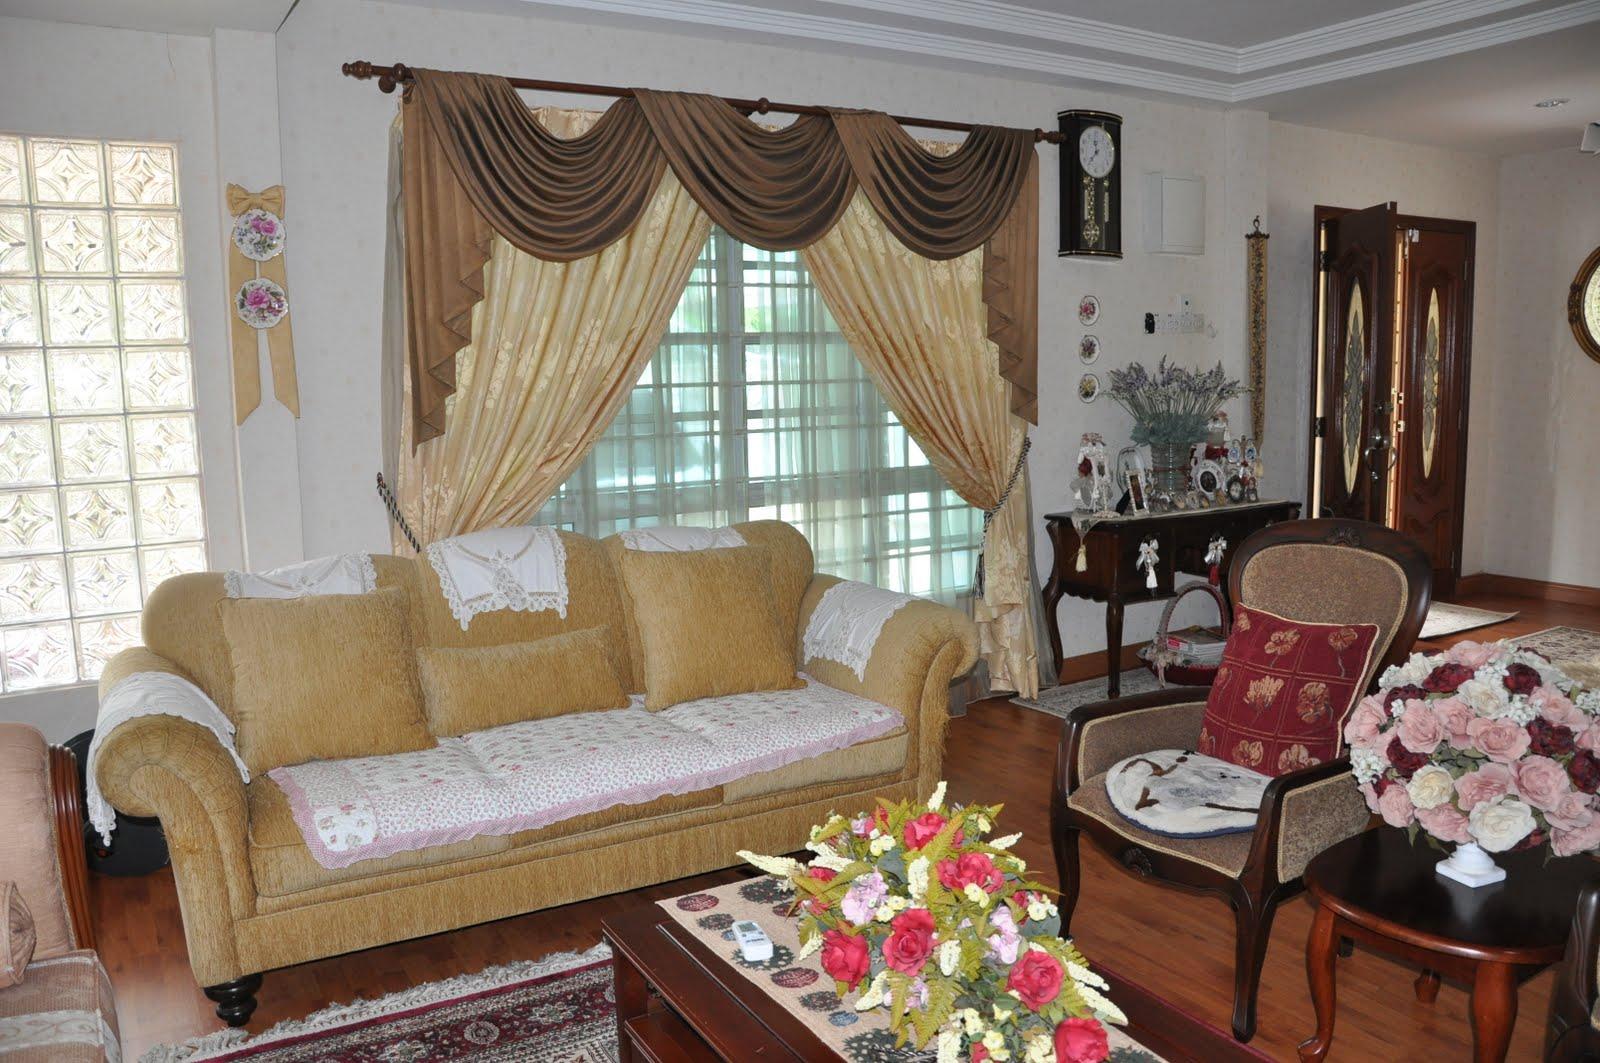 Pandangan Ruang Tamu Utama Menghala Ke Pintu Masuk Cantik Tak Rumah Ni Dah Beberapa Orang Cina Nak Beli Dengan Harga Lebih Rm1 Juta